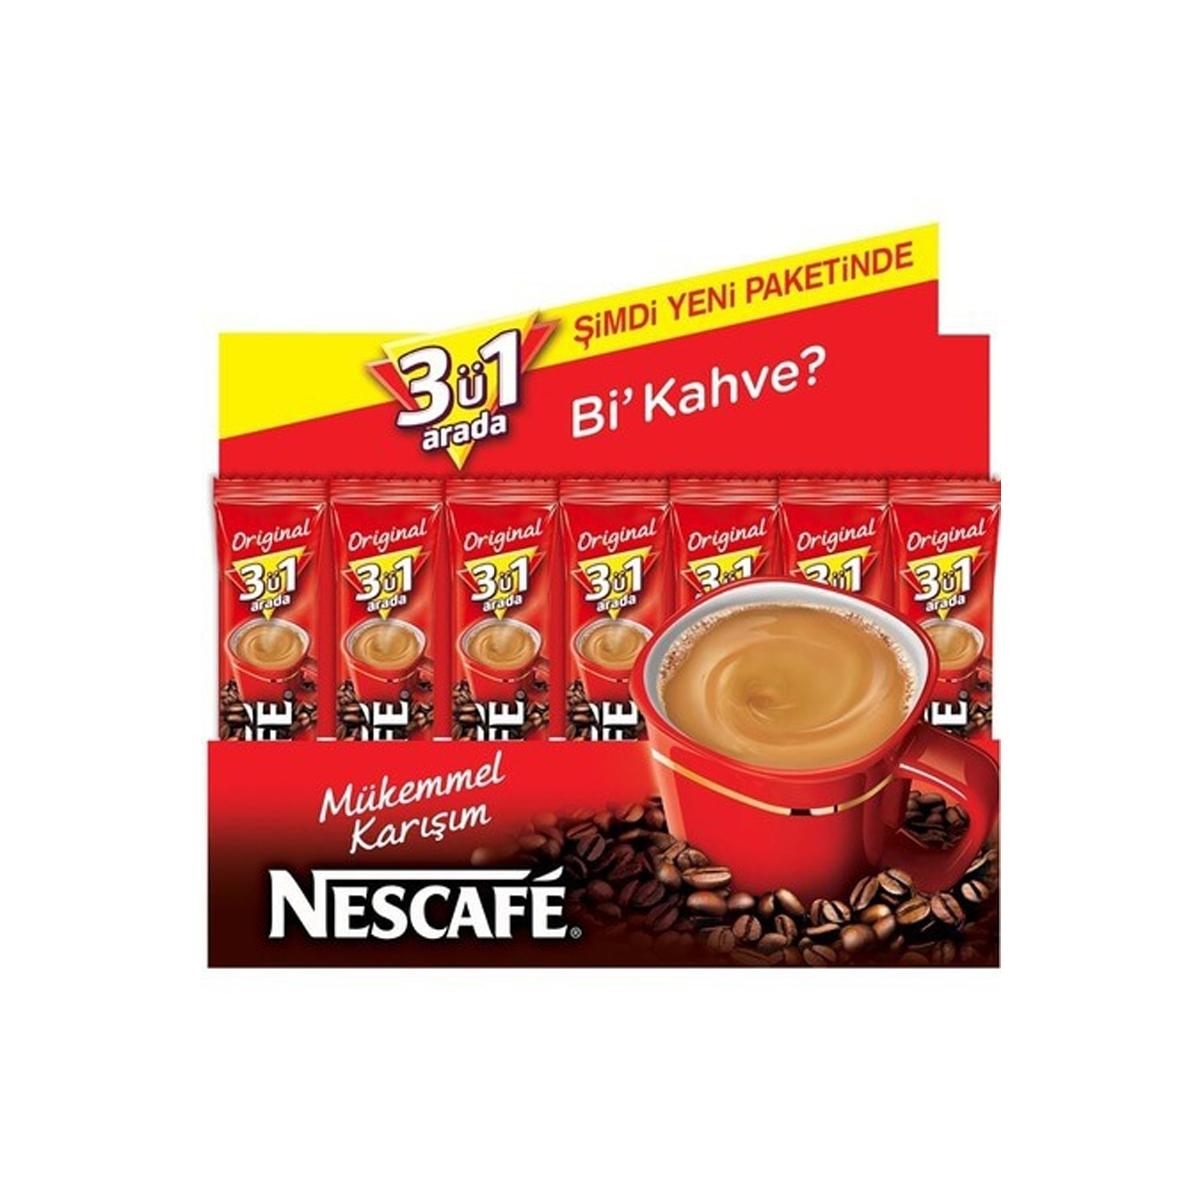 Nescafe 3ü1 Arada Original 96 Adet resmi